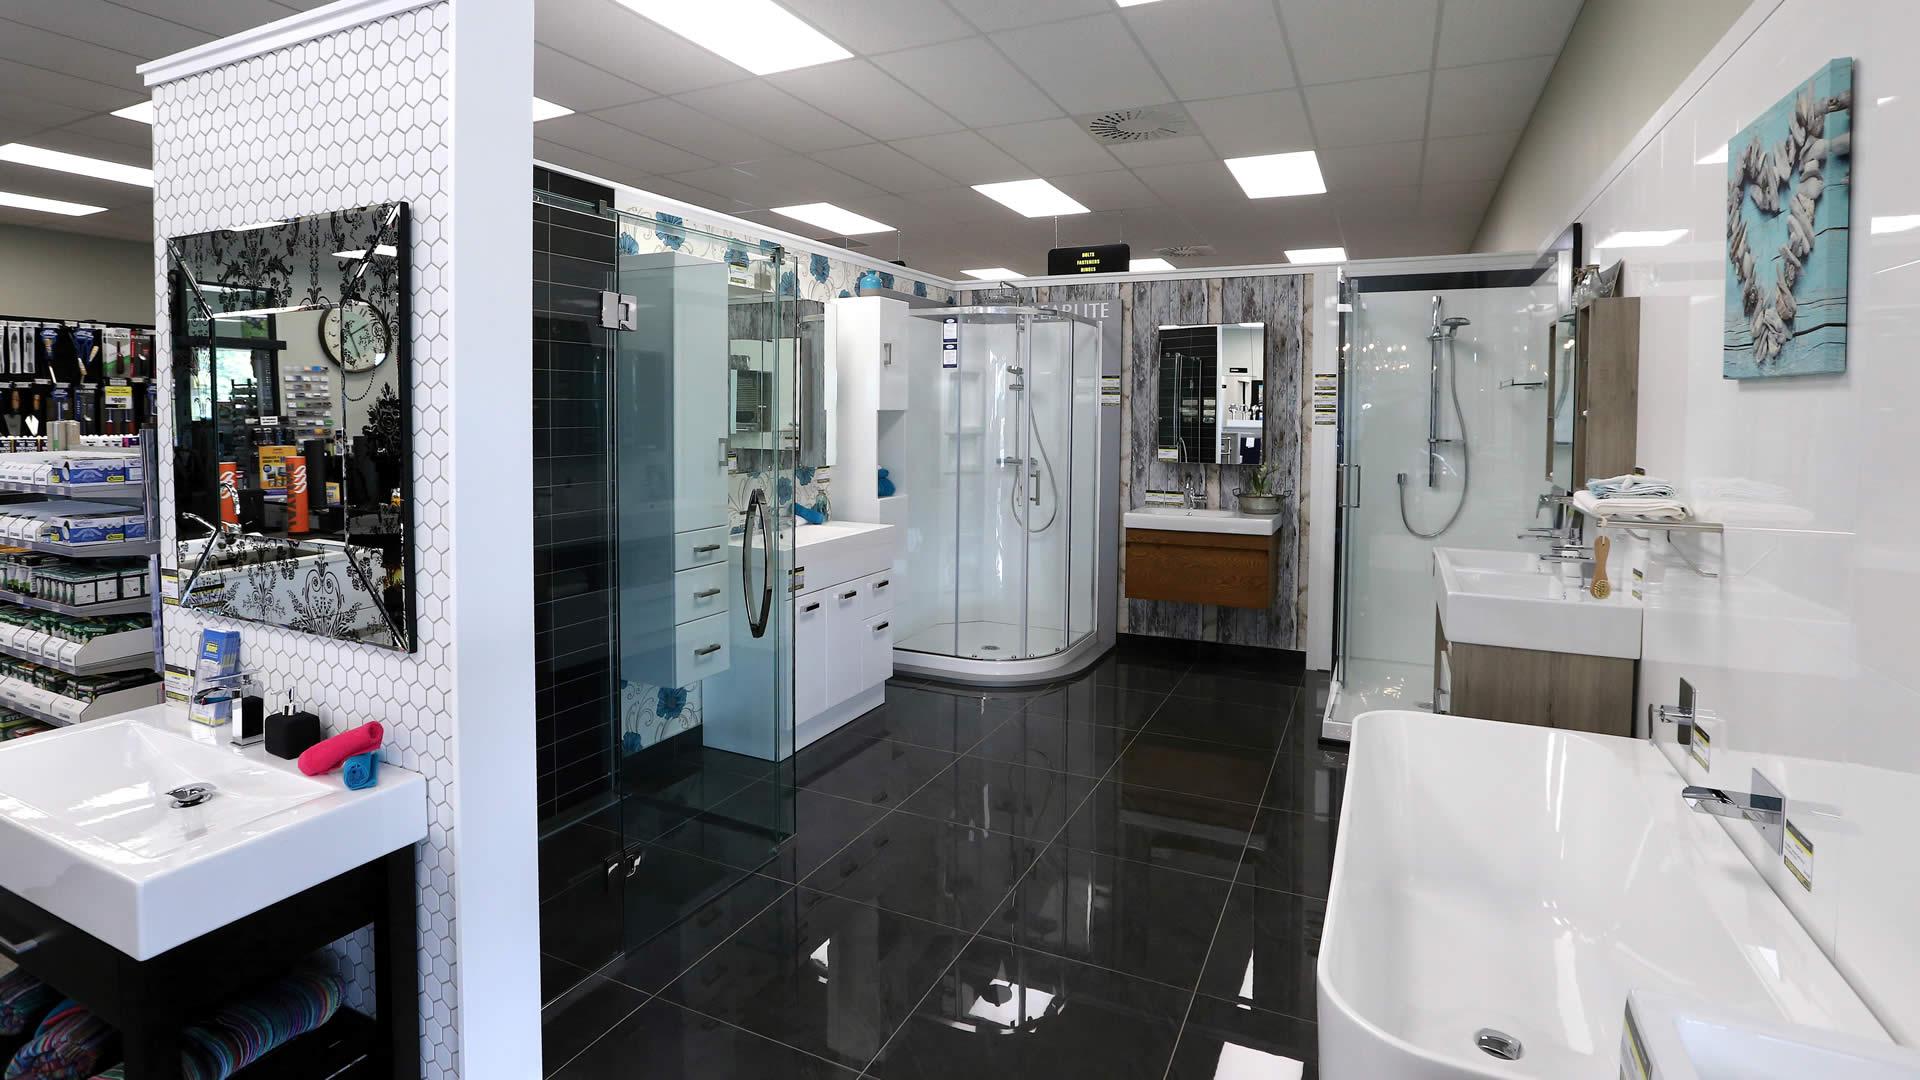 ... Bathroom Accessories Display